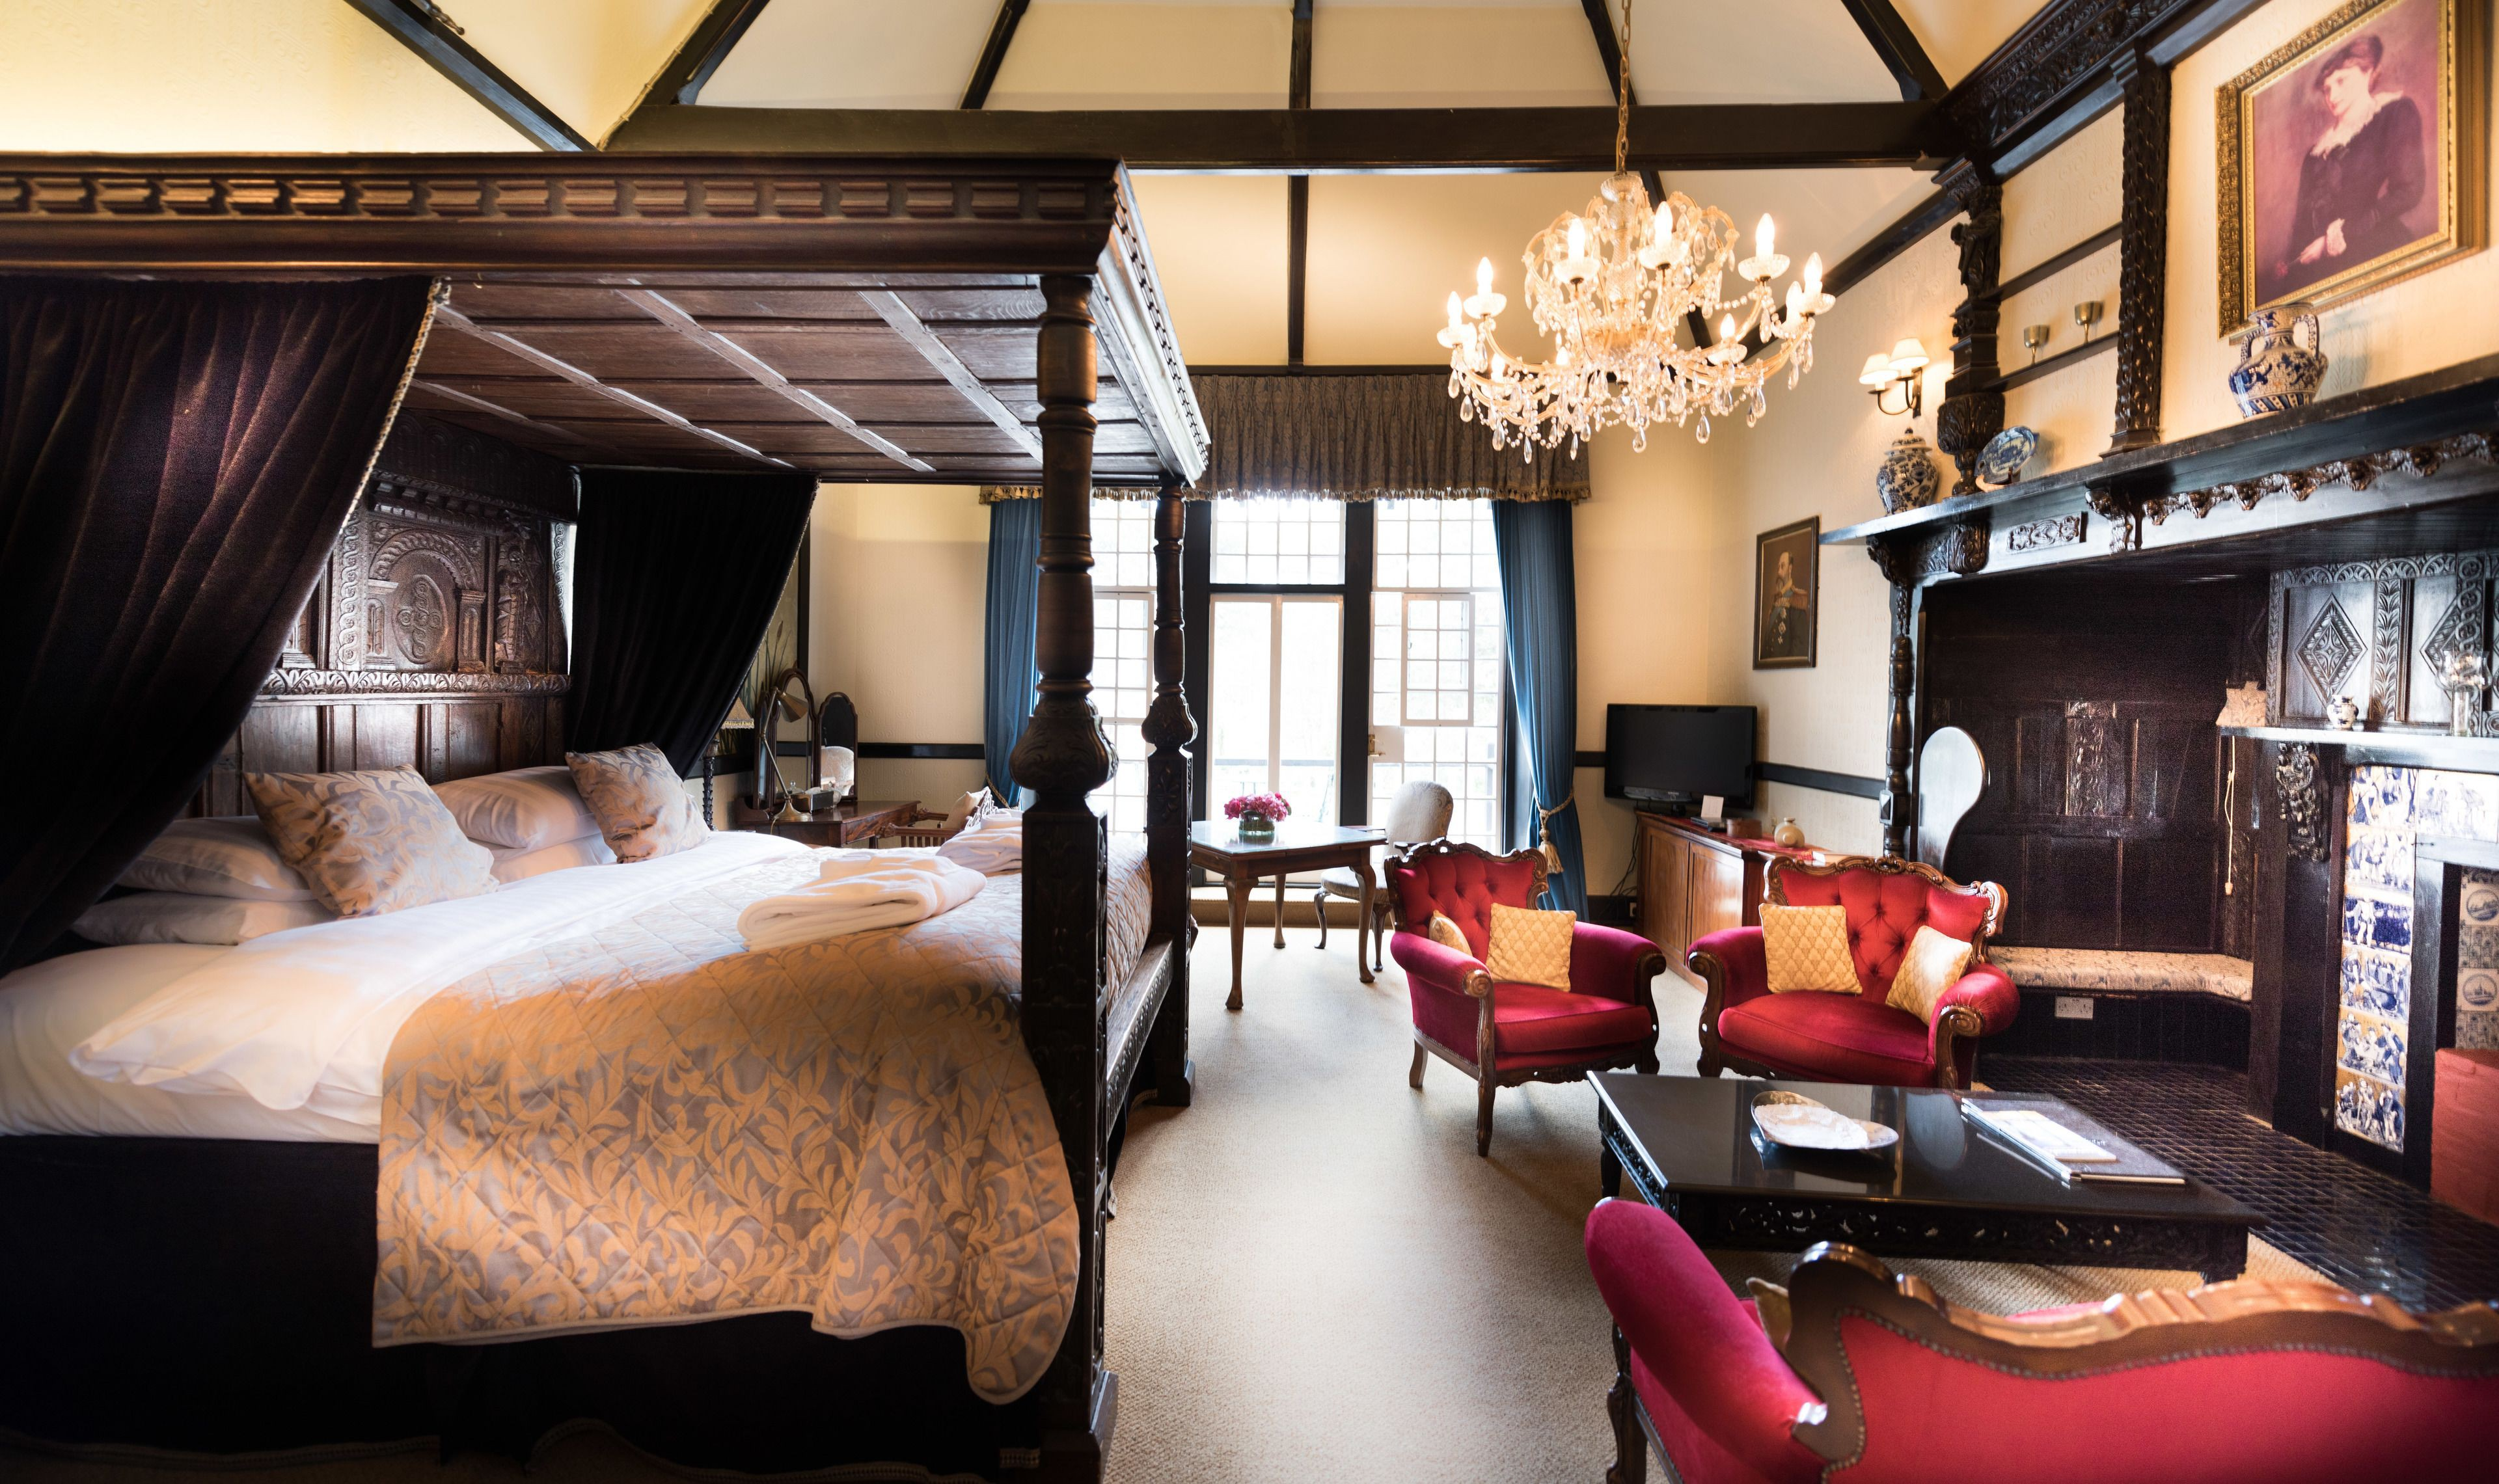 Courtesy of Langtry Manor Hotel / Expedia.com